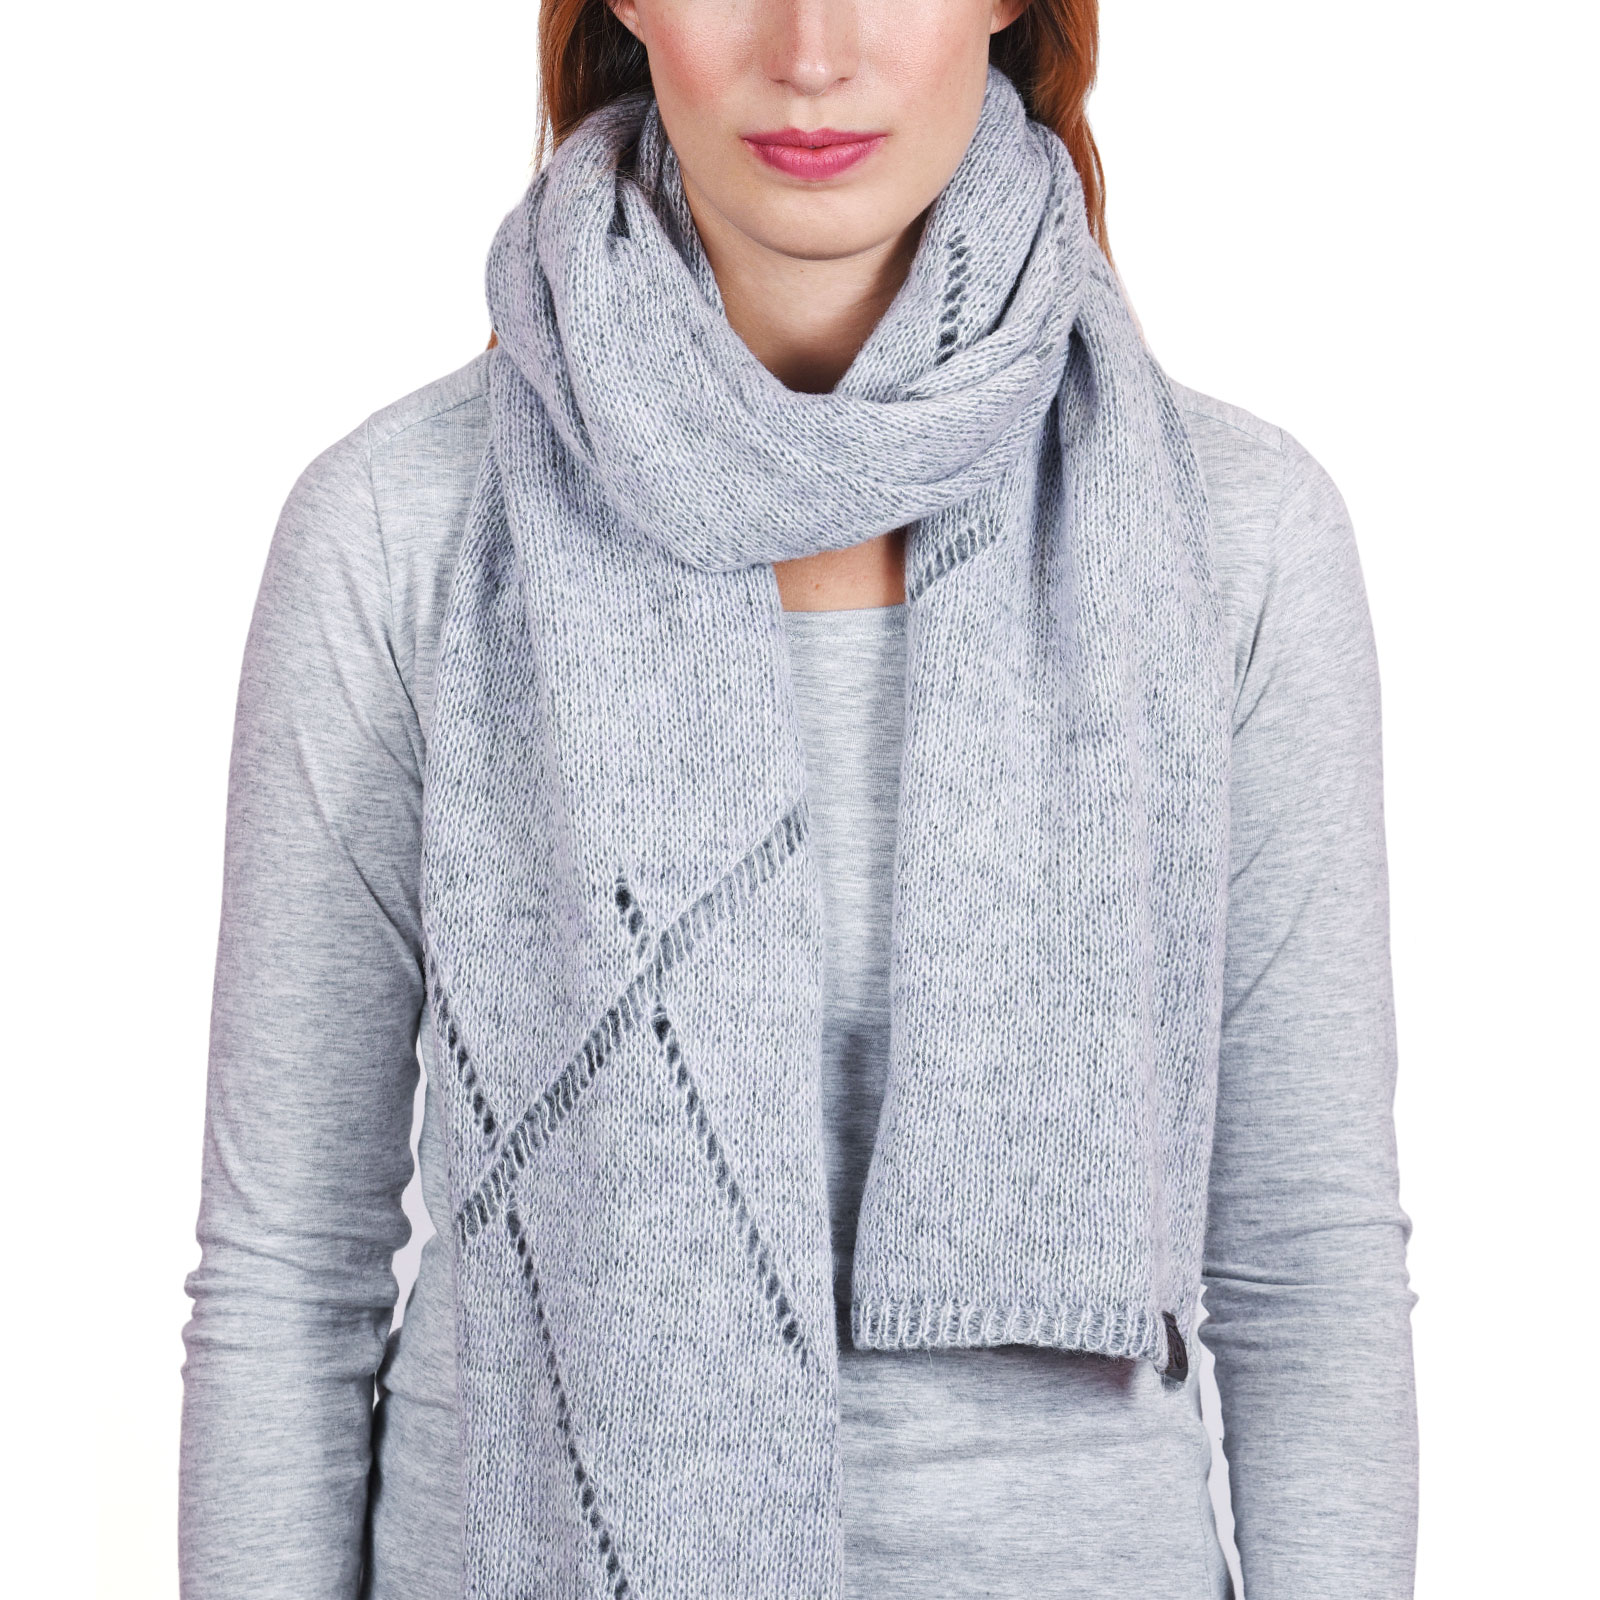 AT-04562-VF16-P-echarpe-femme-tendance-grise-souris